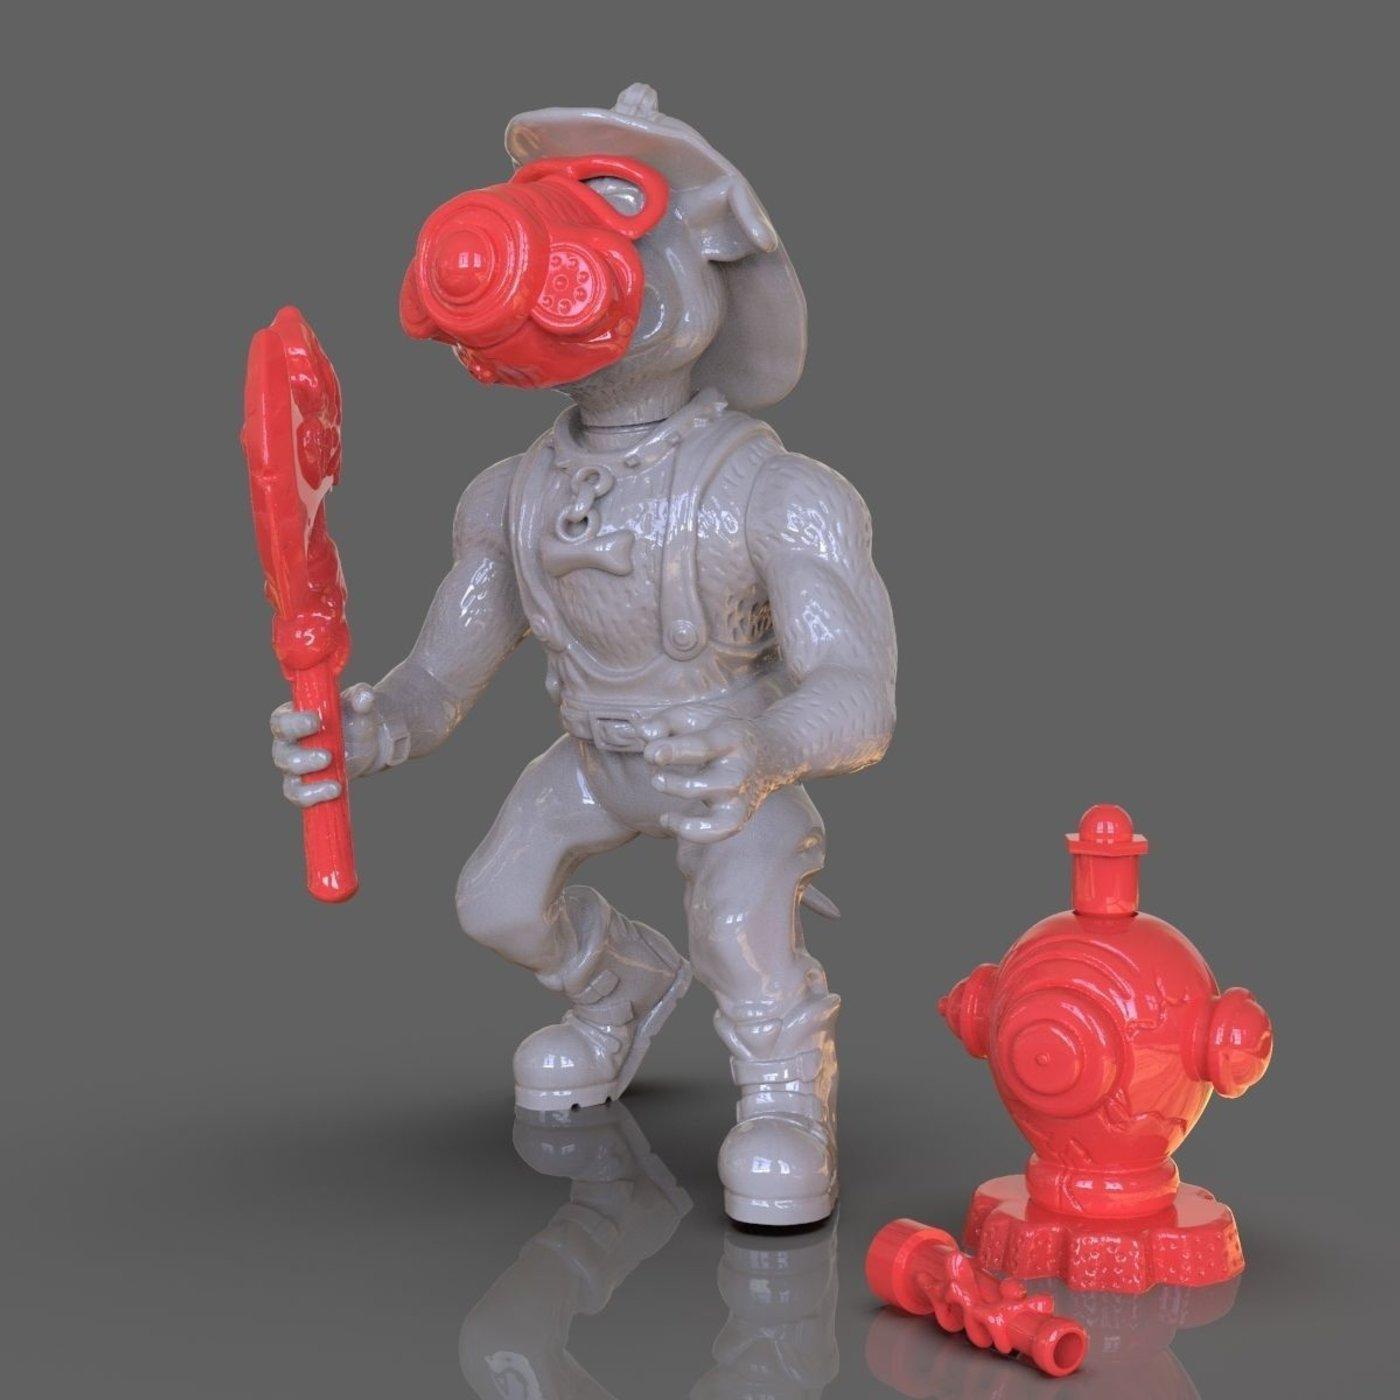 Hot Spots a replica toy